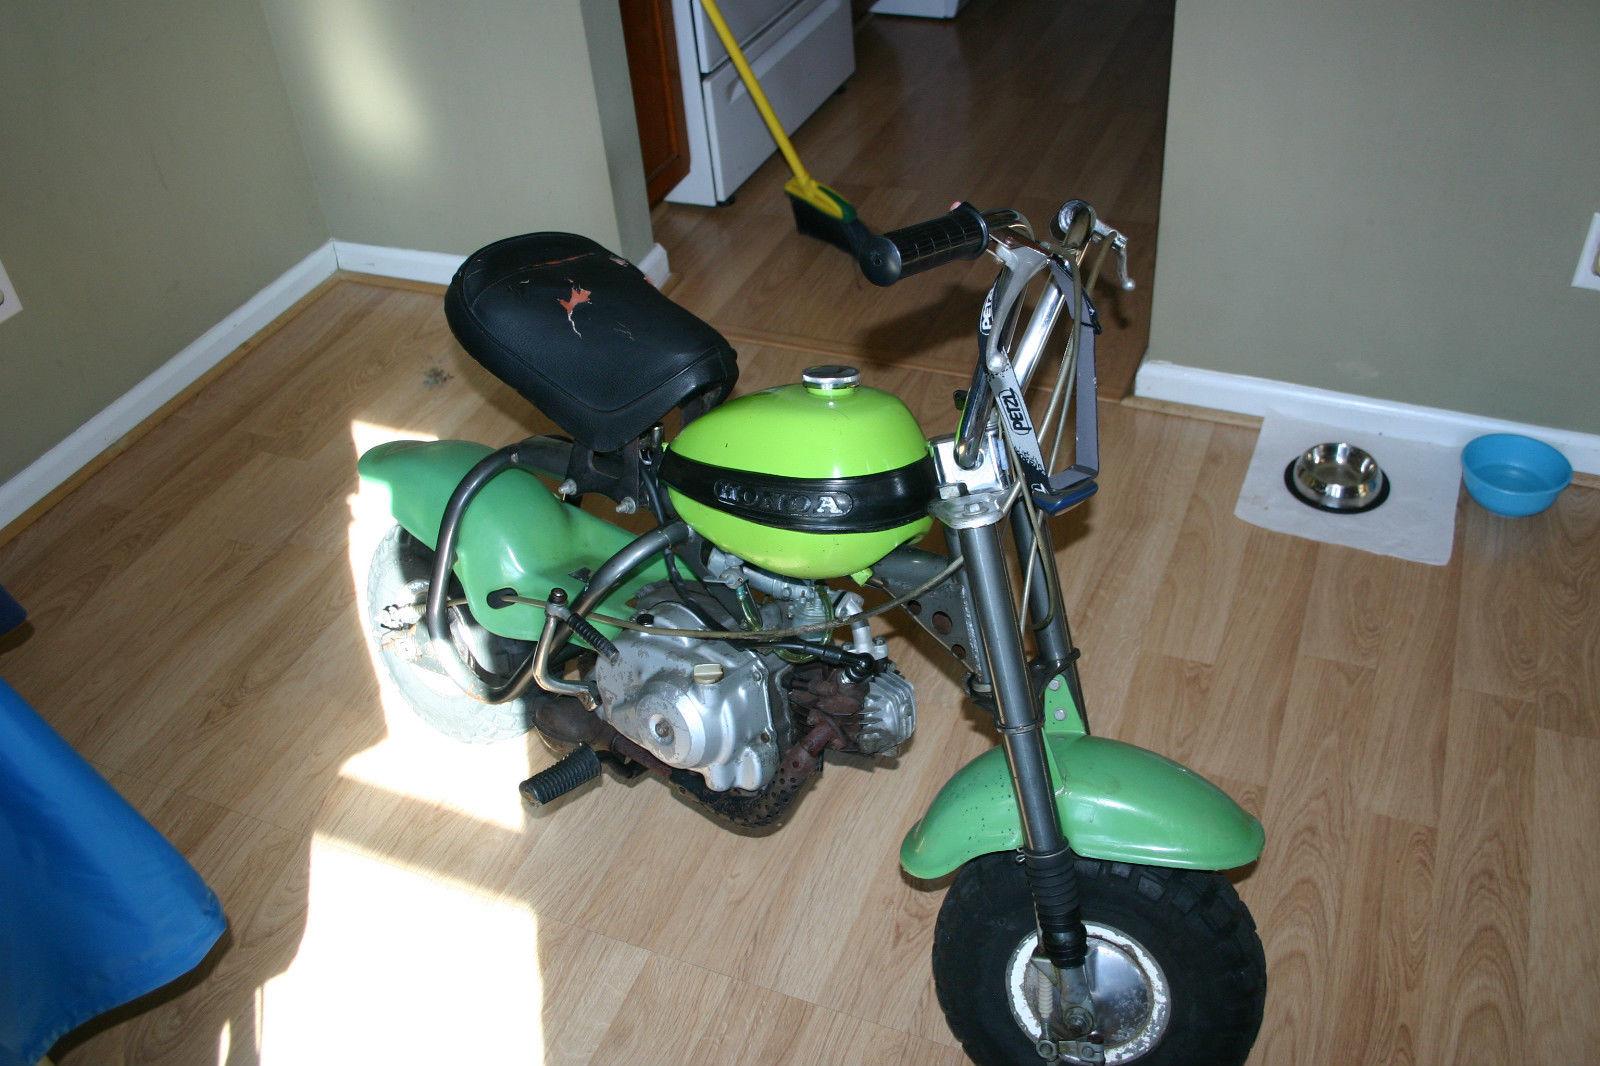 1970 Honda Qa50 Ko Green Survior Rare 50cc Dirt Bike